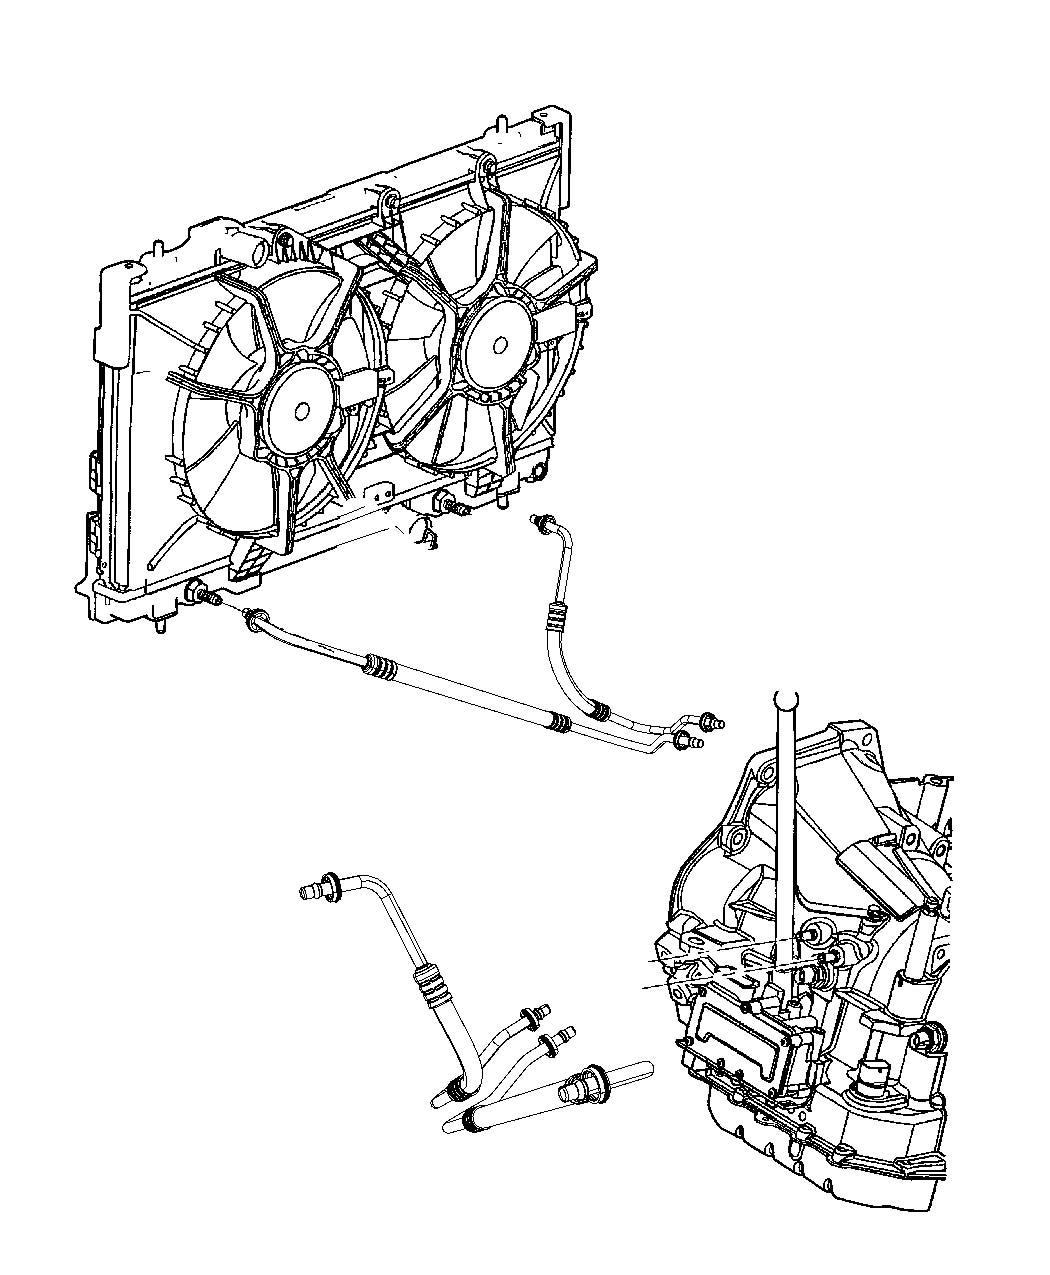 Diagram For Dodge Neon Radiator